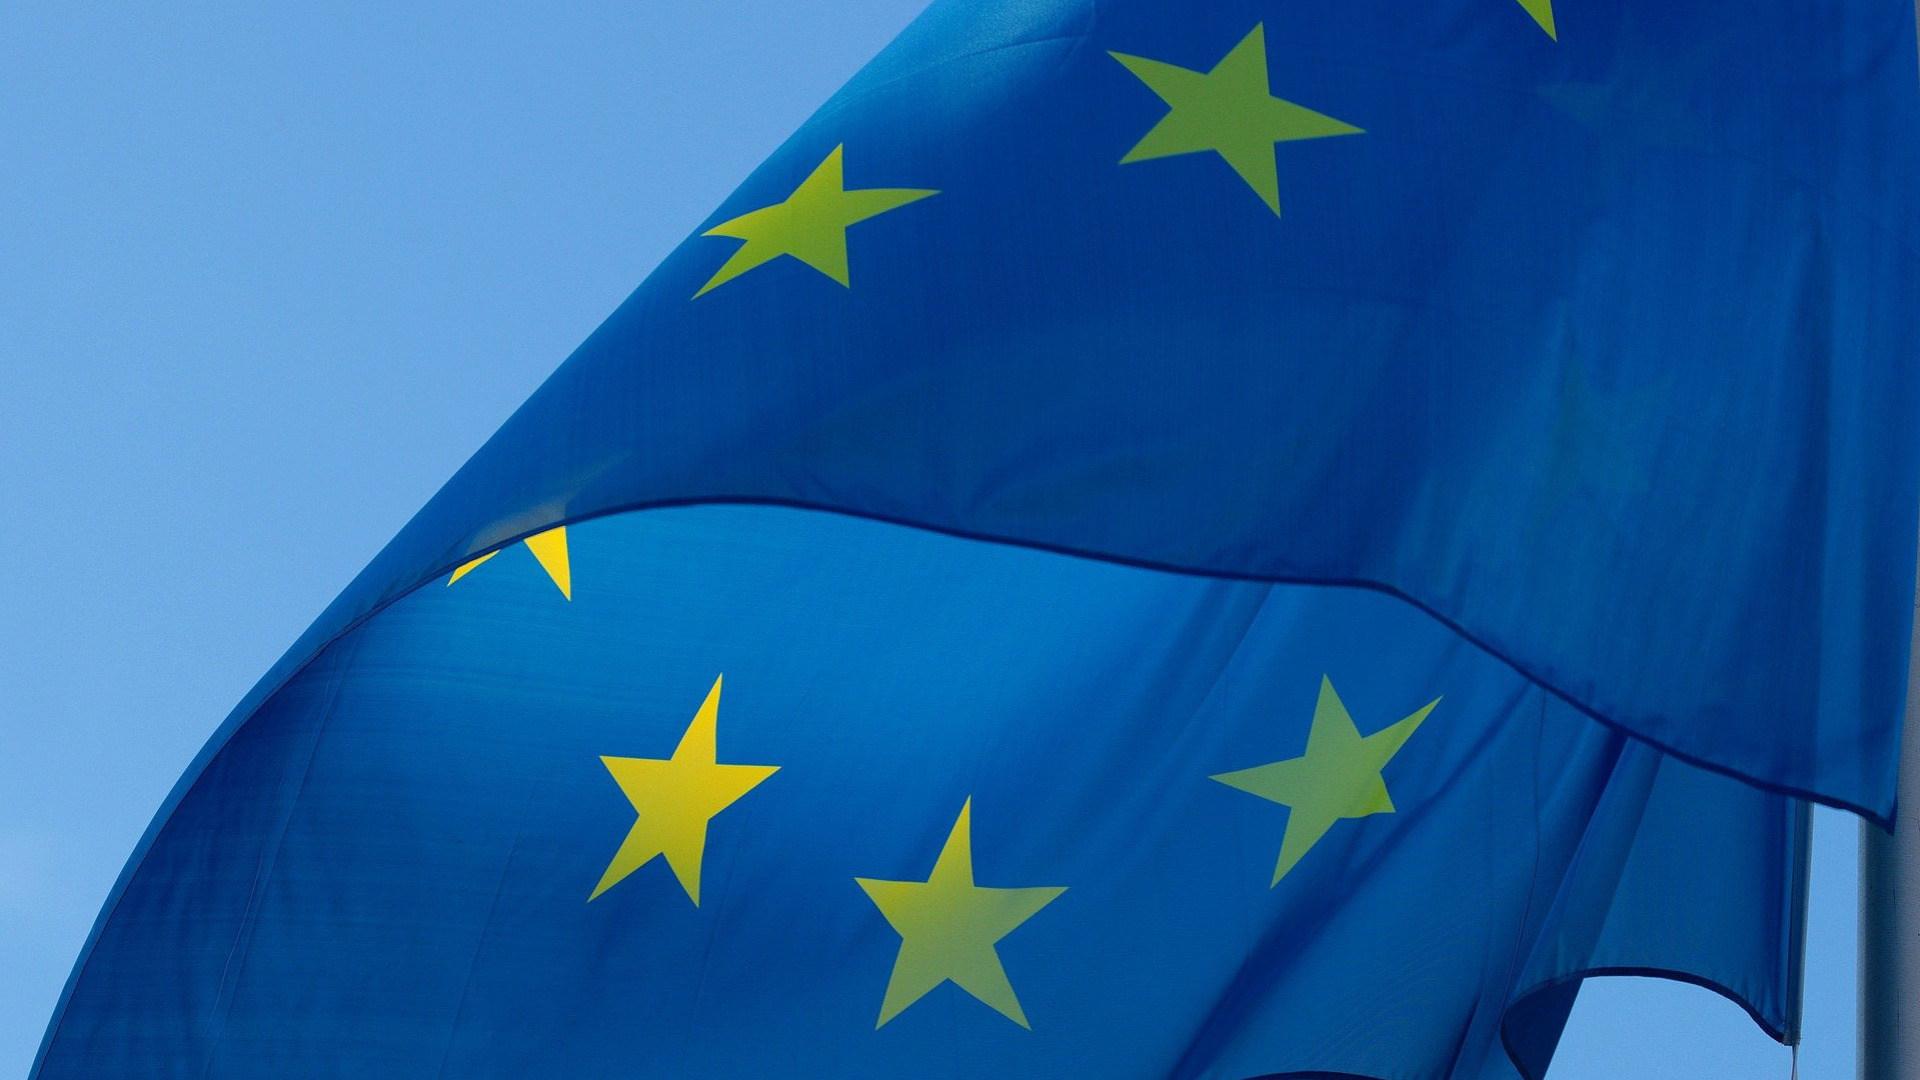 Eu, Europa, Europäische Union, Flagge, EU-Flagge